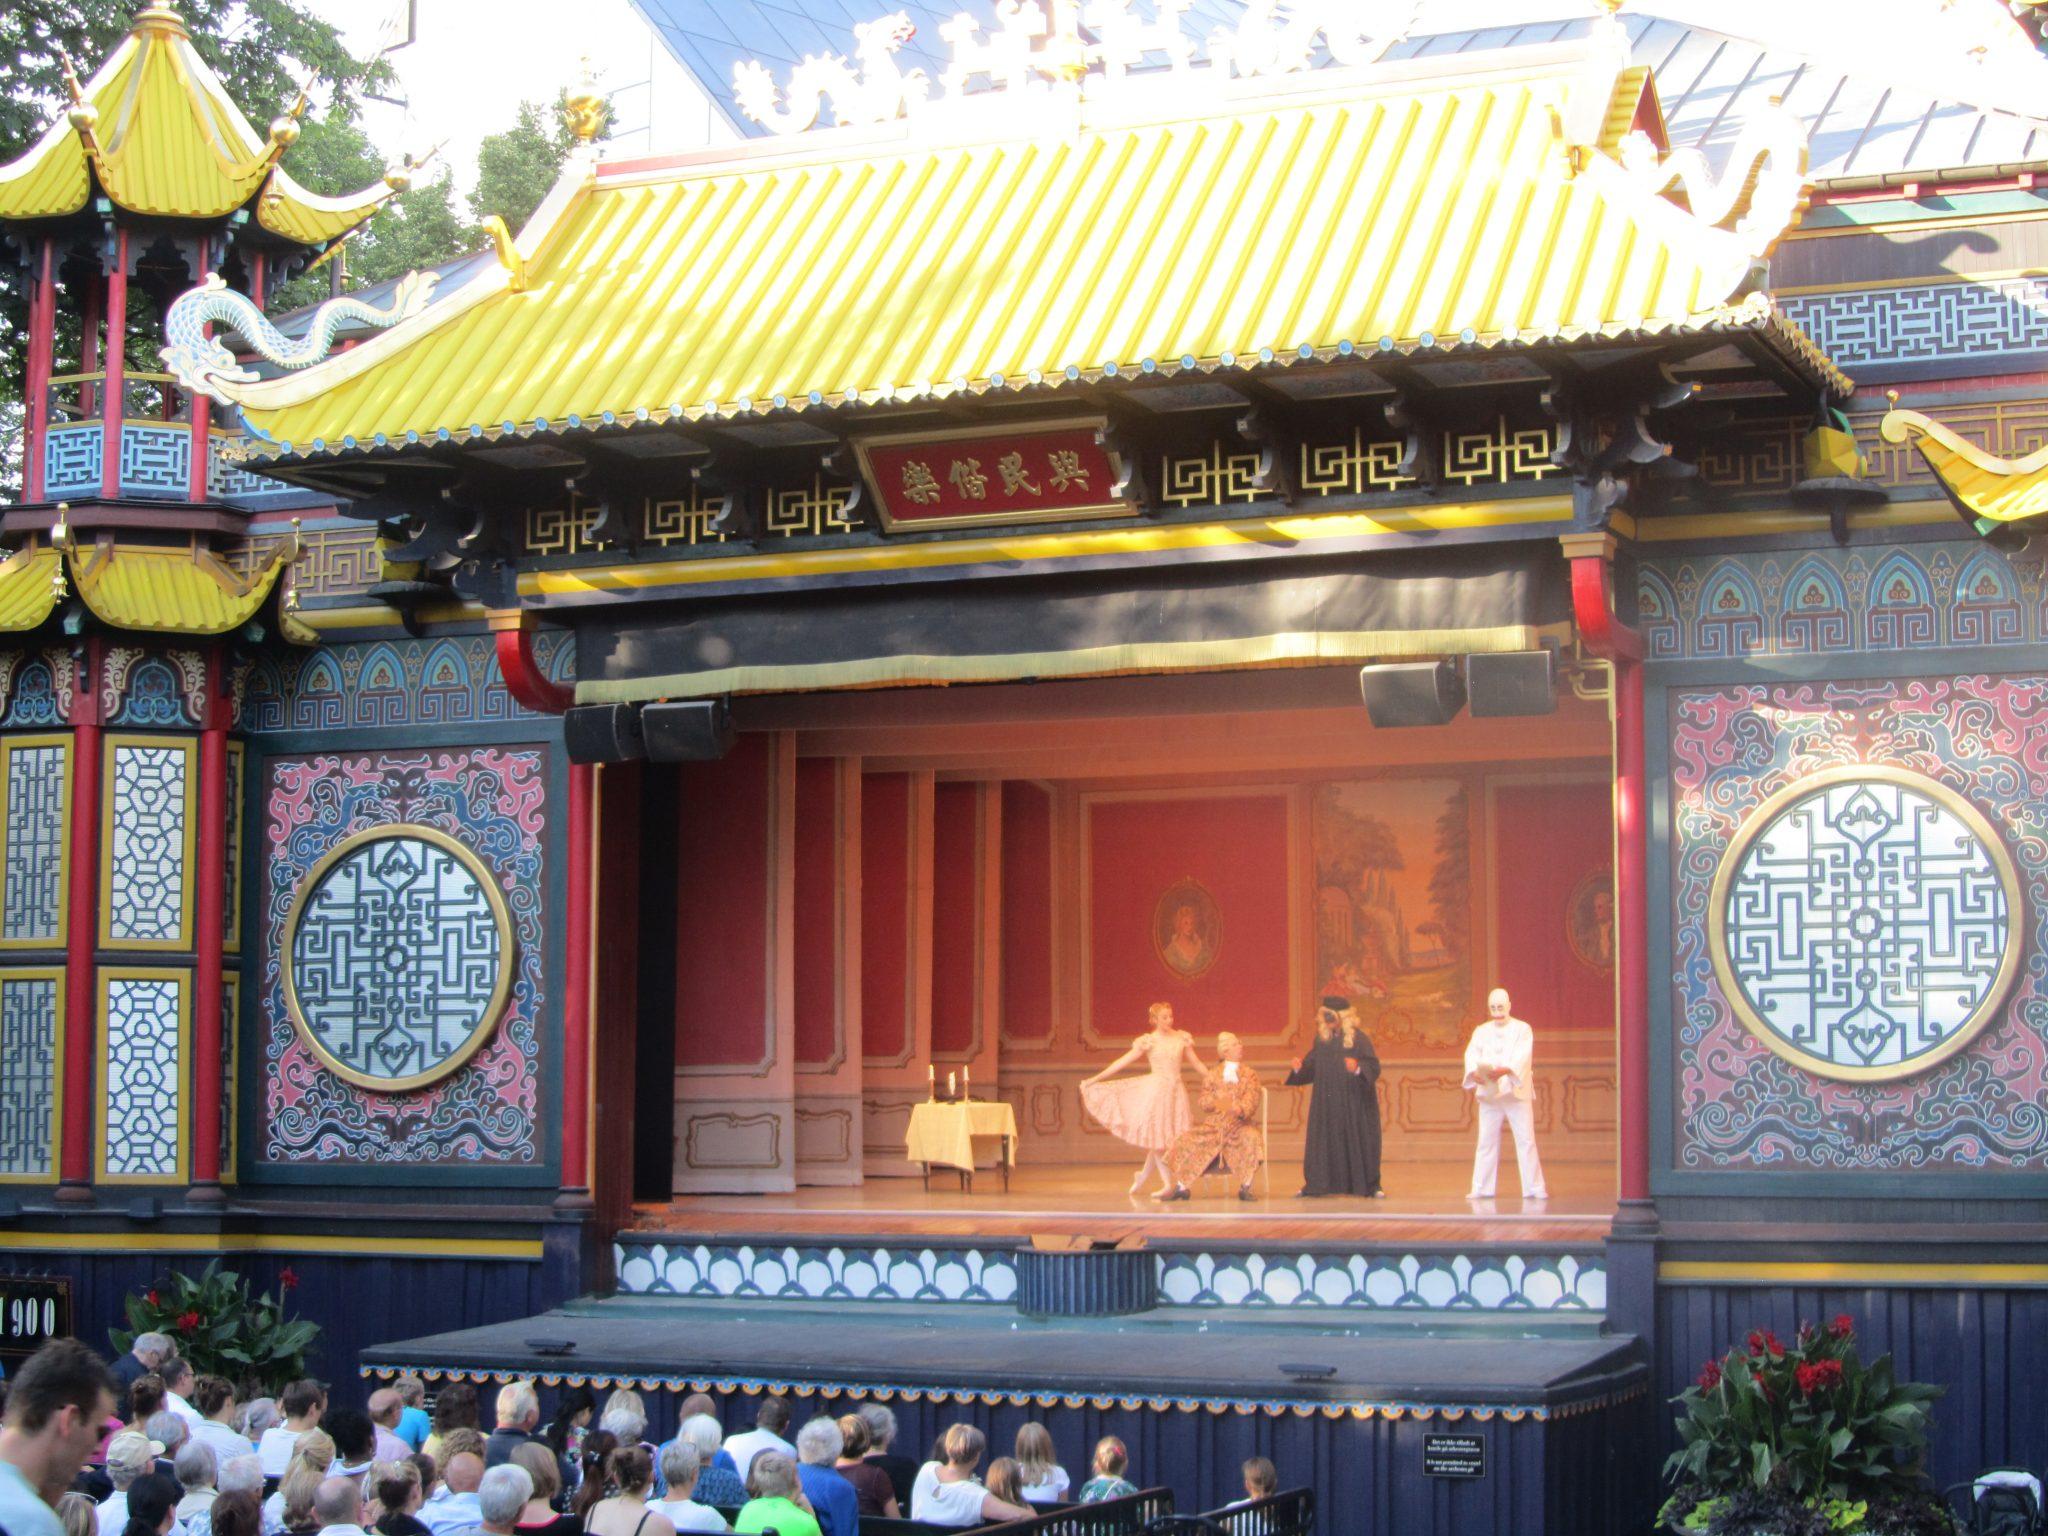 Pantomime at Tivoli, Copenhagen, Denmark